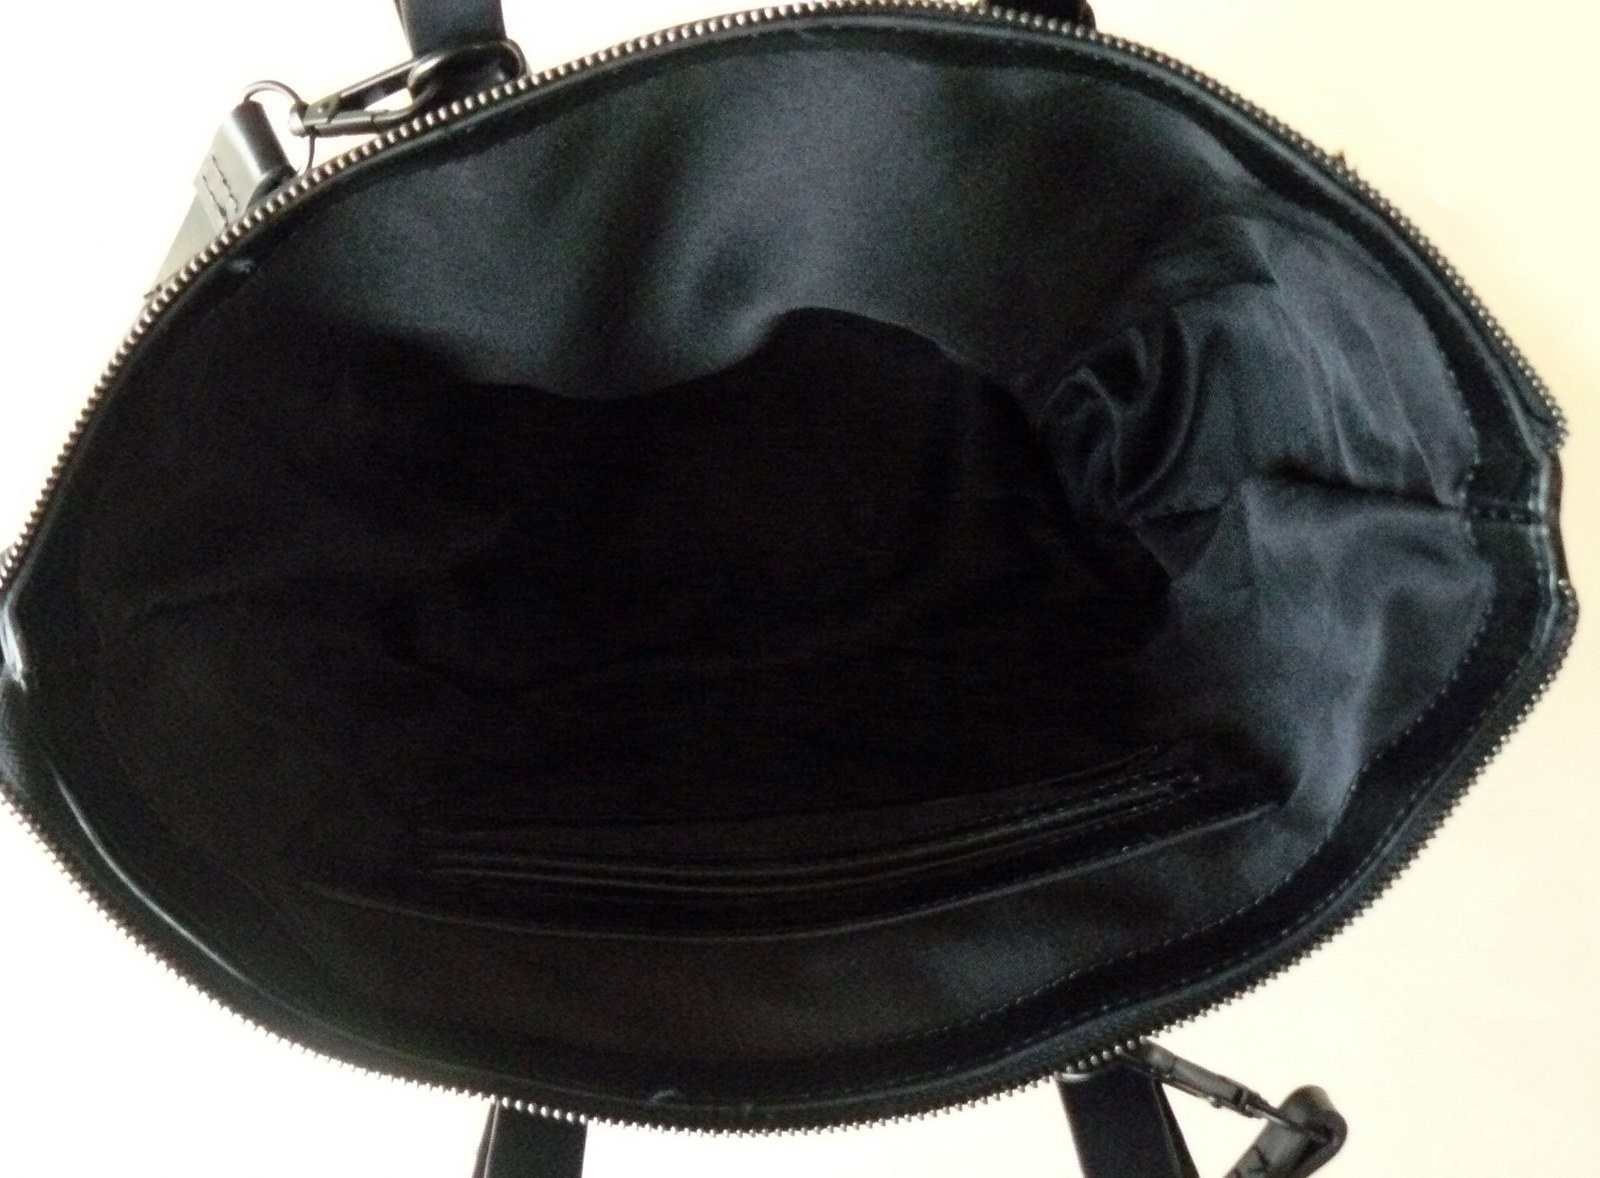 Zara Black Faux Leather Tote Shopper Shoulder Bag Vegan Friendly